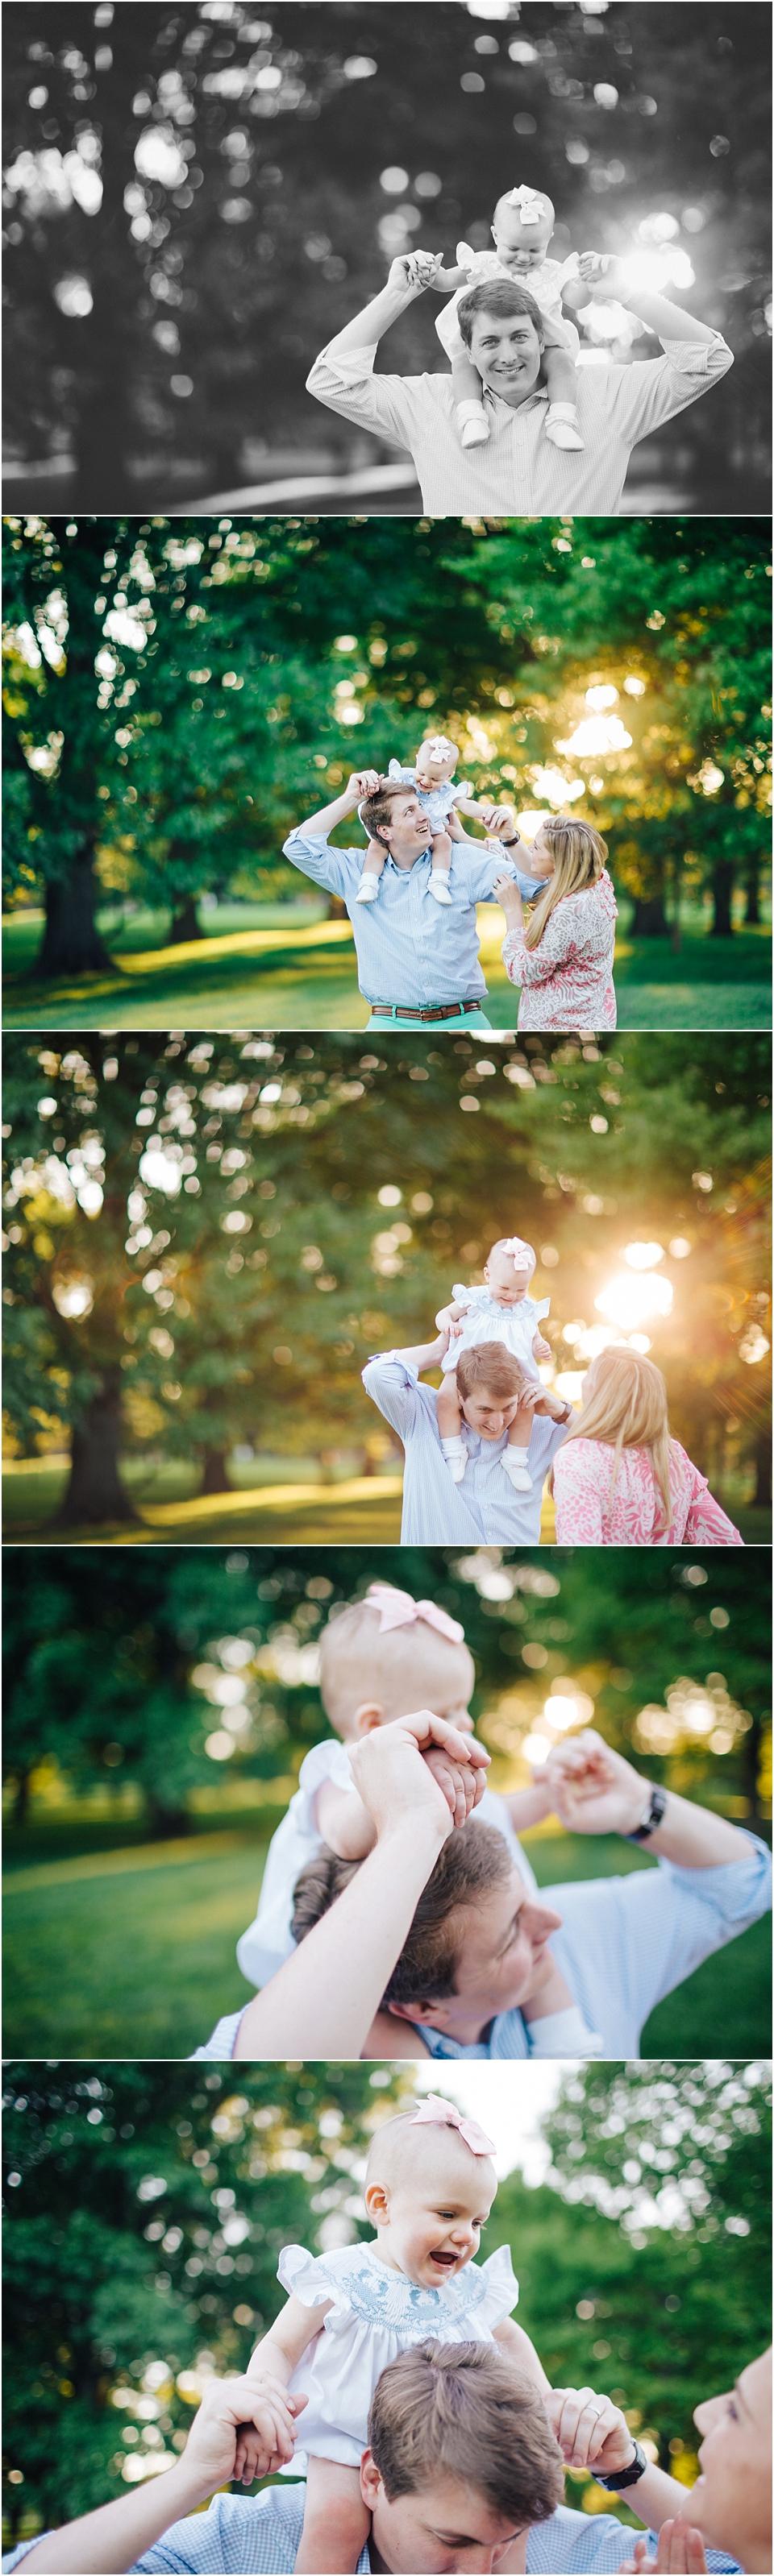 kansascityfamilyphotographer_0316